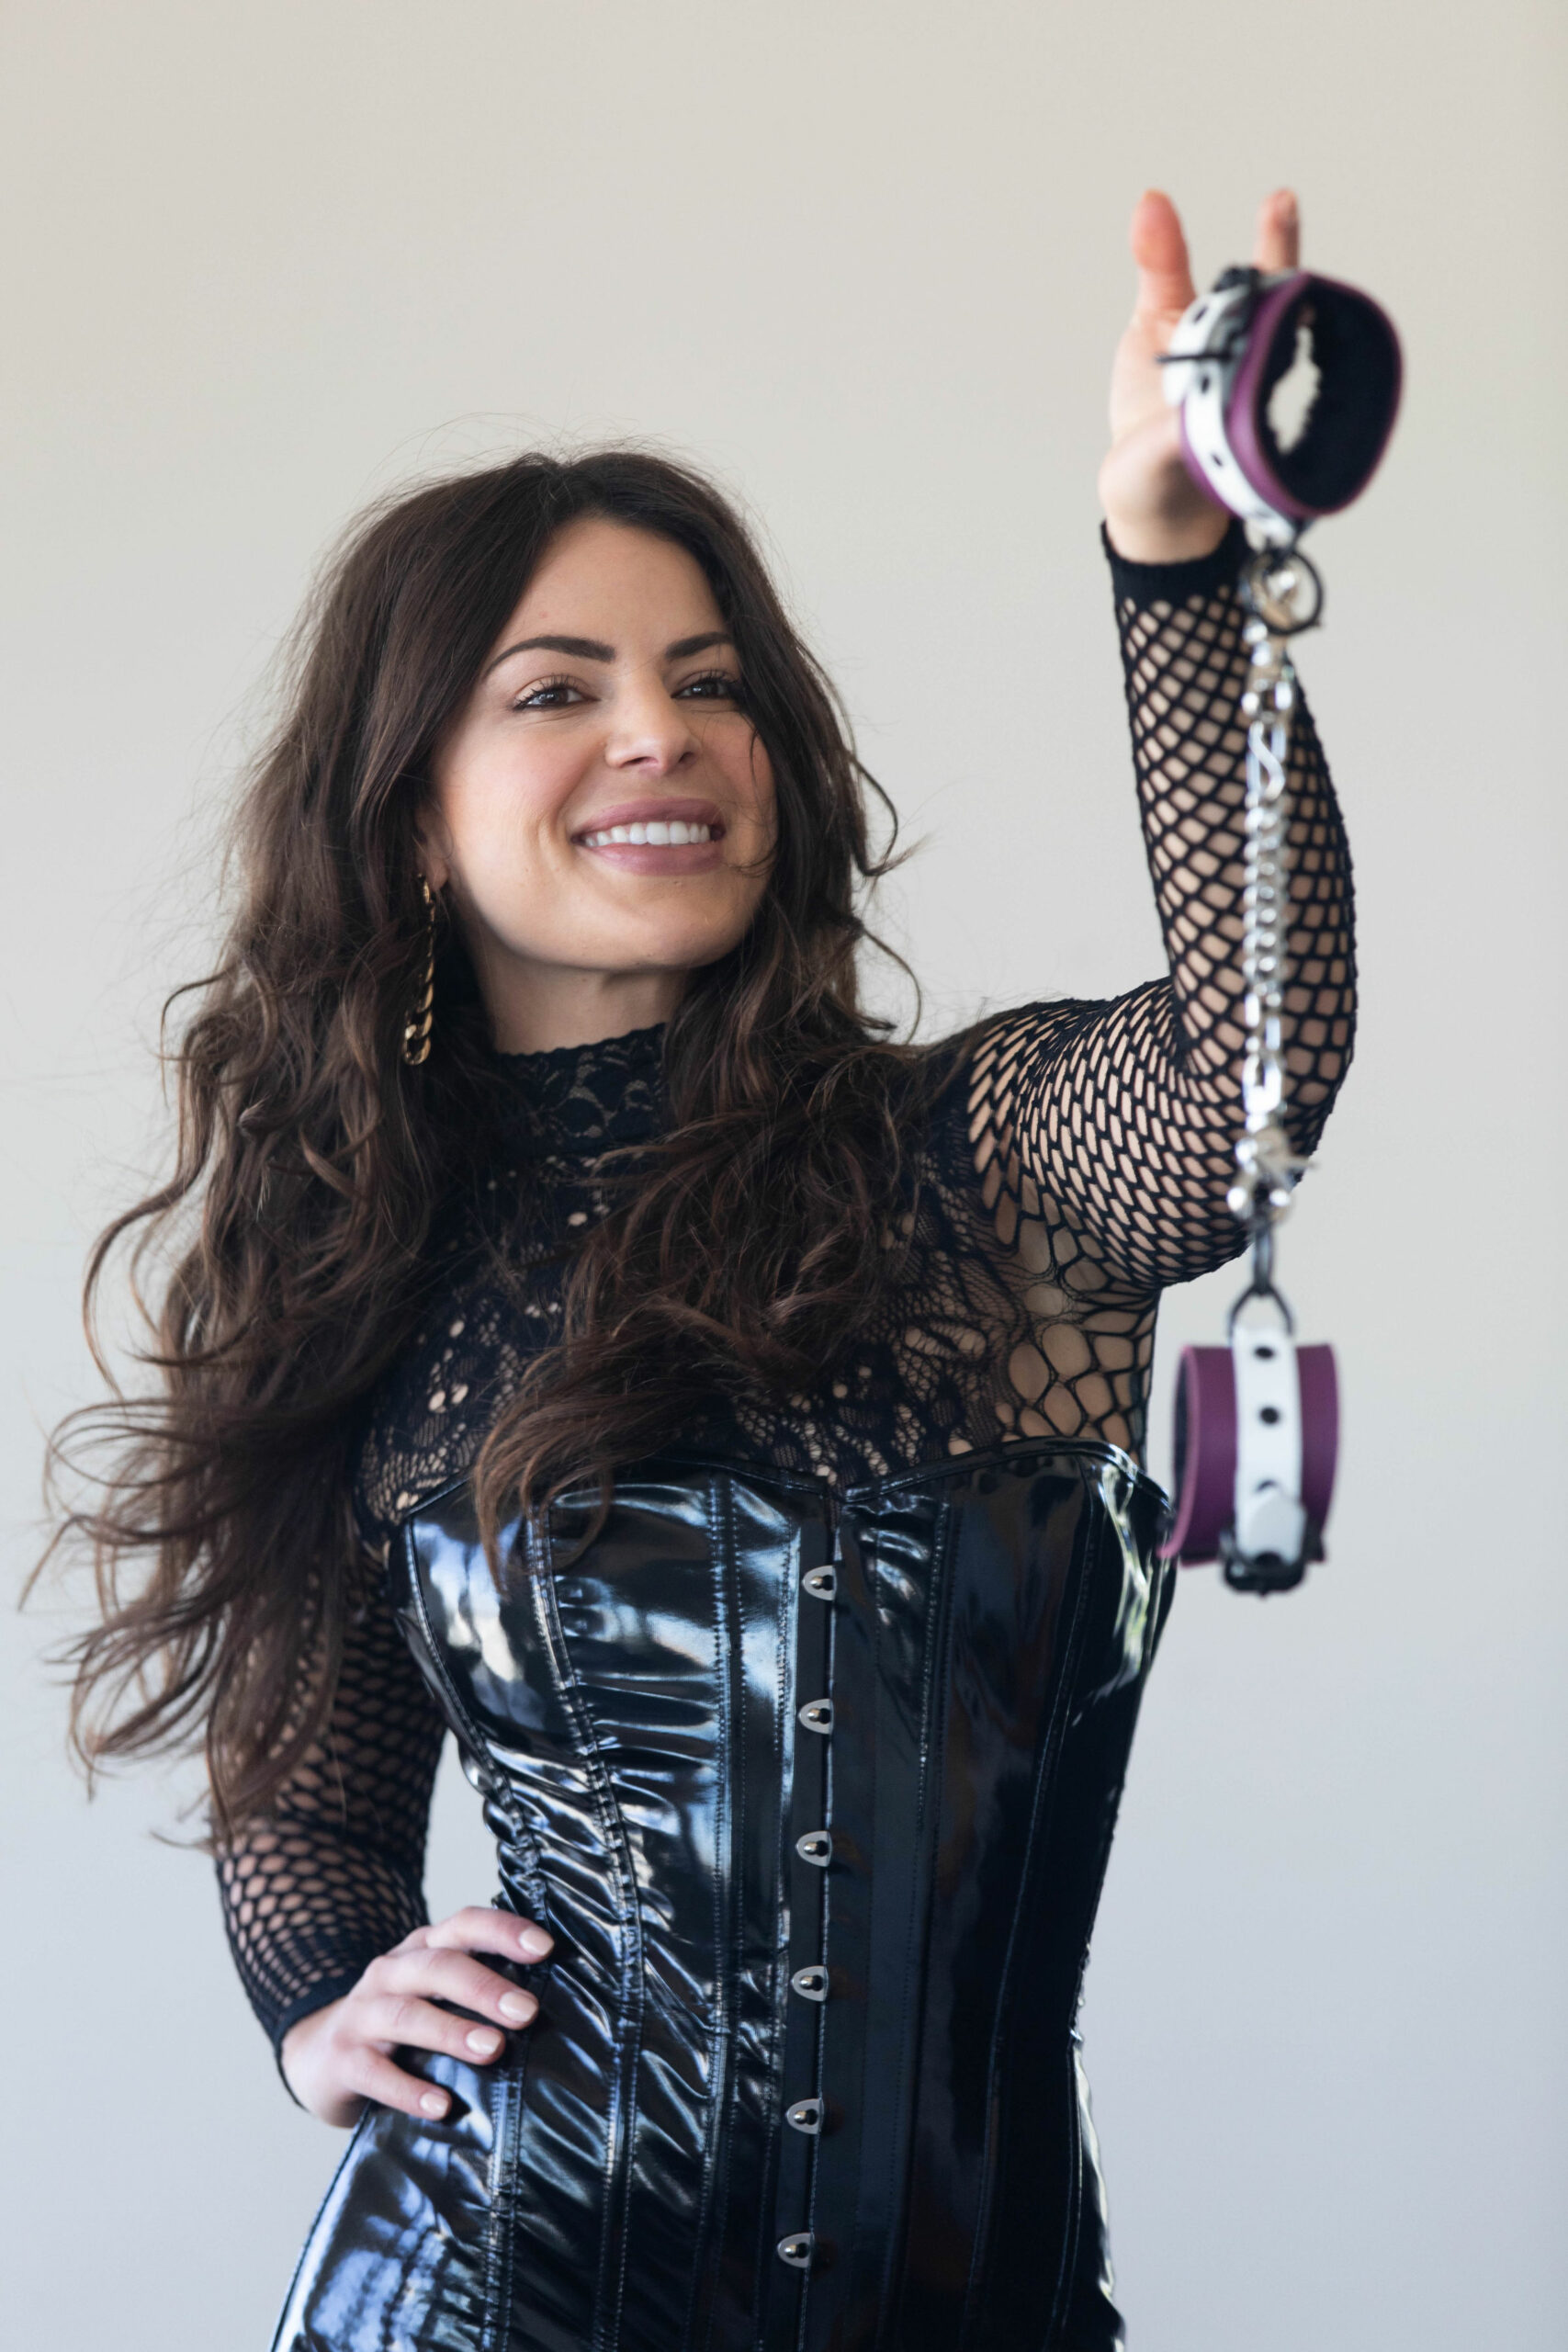 Femme Domme BDSM | Las Vegas, Nevada | Miss Yulia